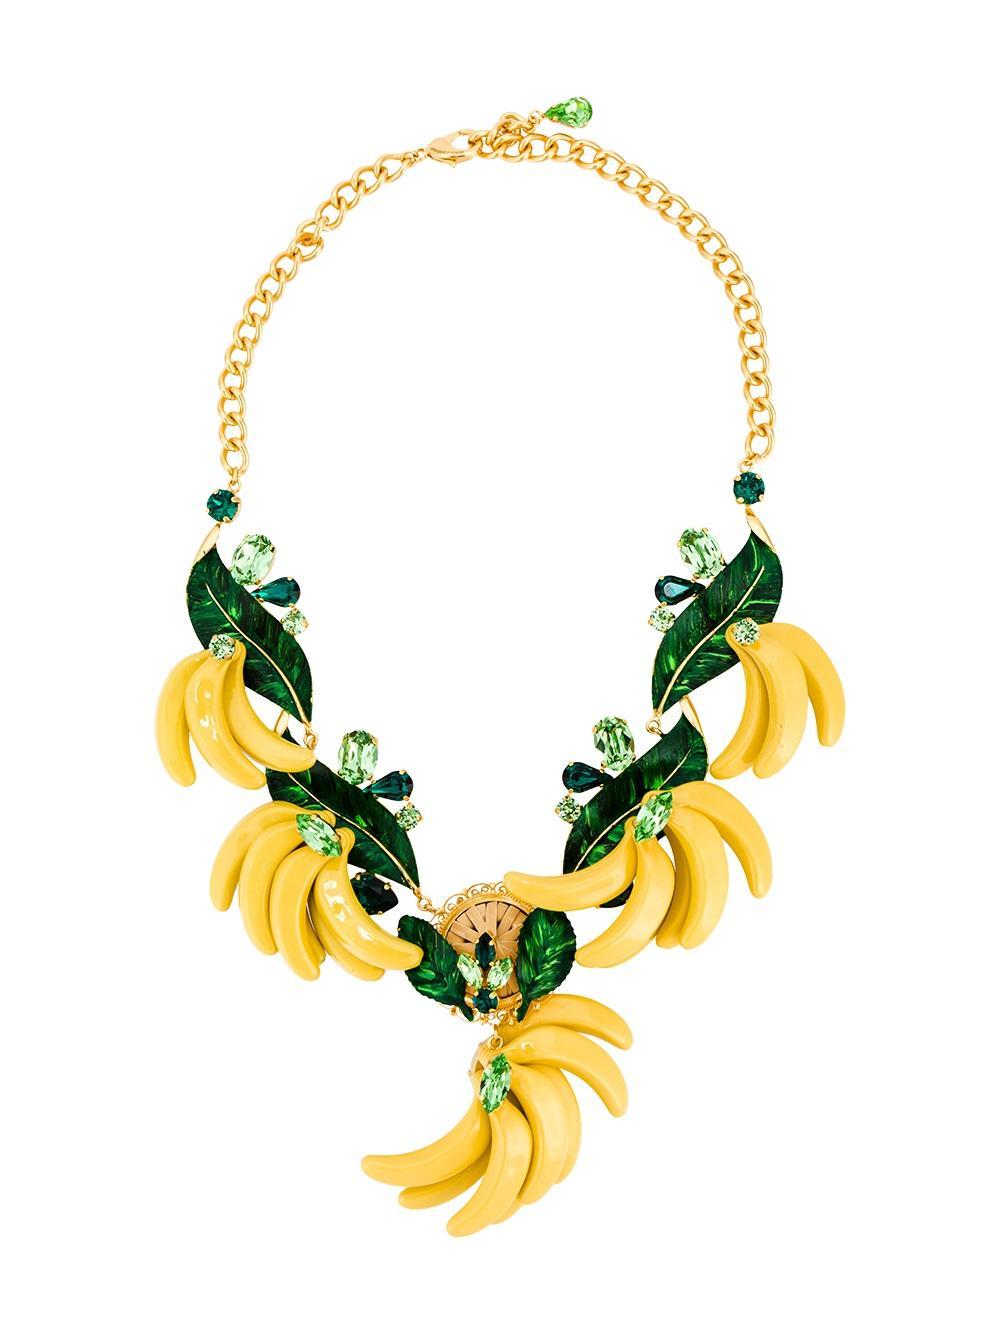 DOLCE & GABBANA Banana necklace, FarFetch.com